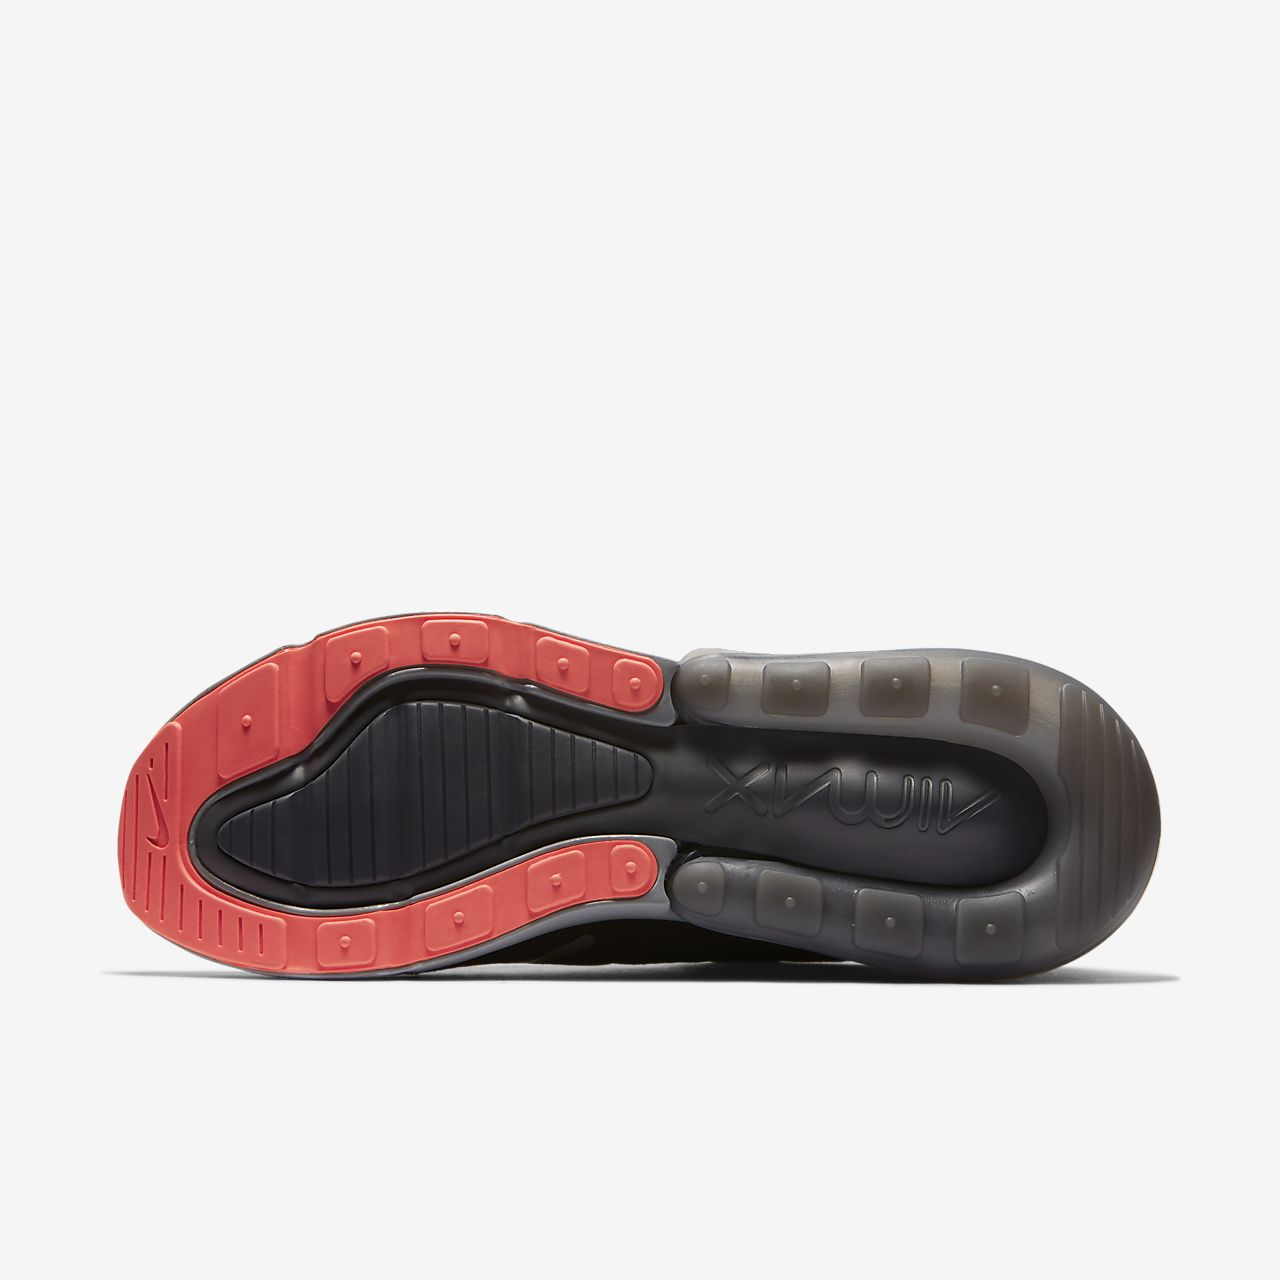 a0d3eabe0b565 Nike Air Max 270 Flyknit Zapatillas - Hombre. Nike.com ES